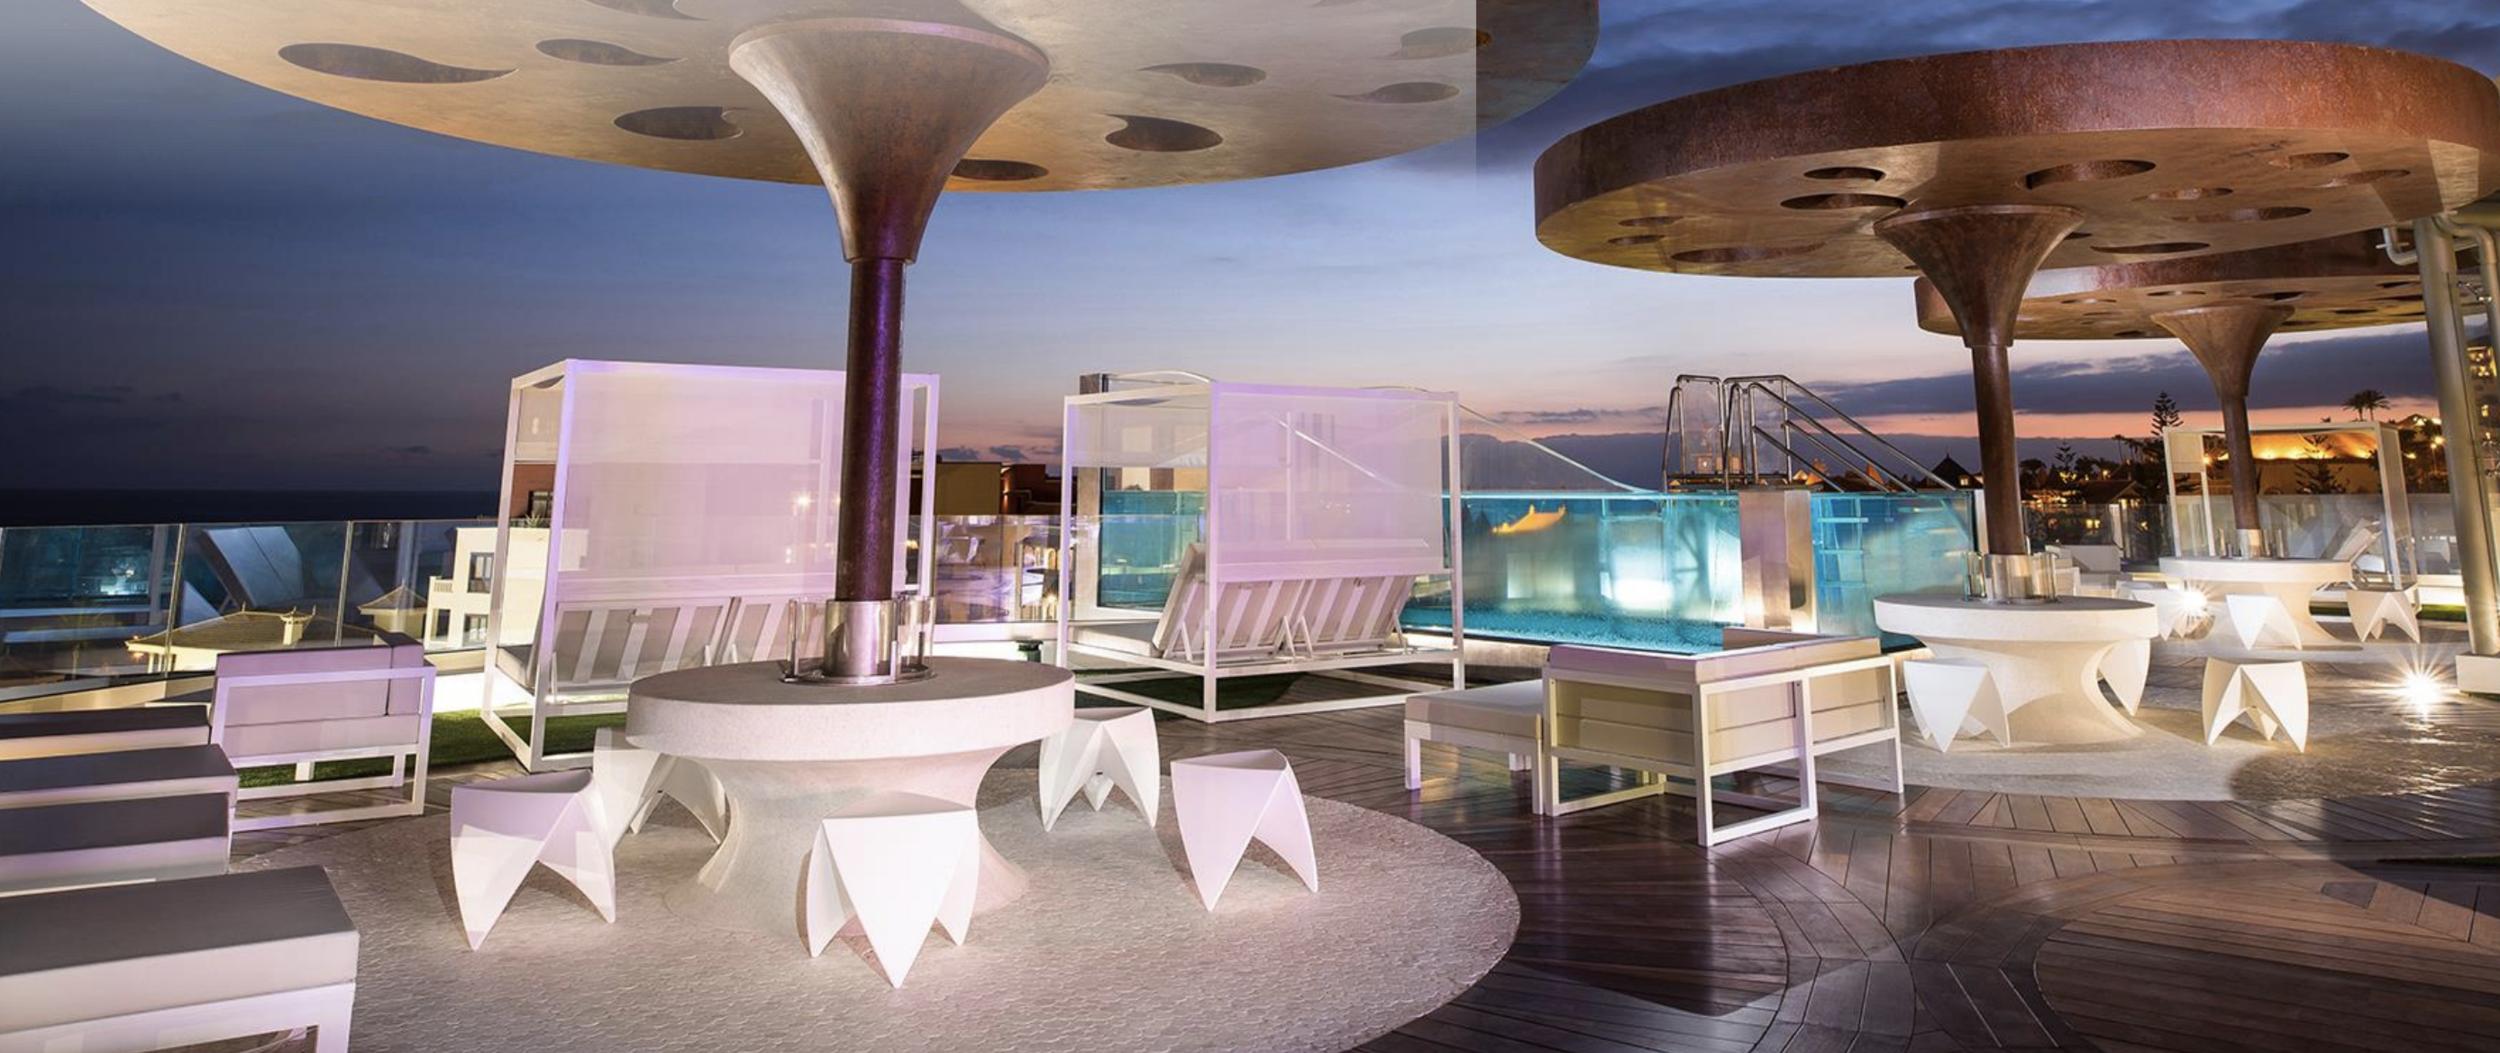 Sky bar with fantastic views